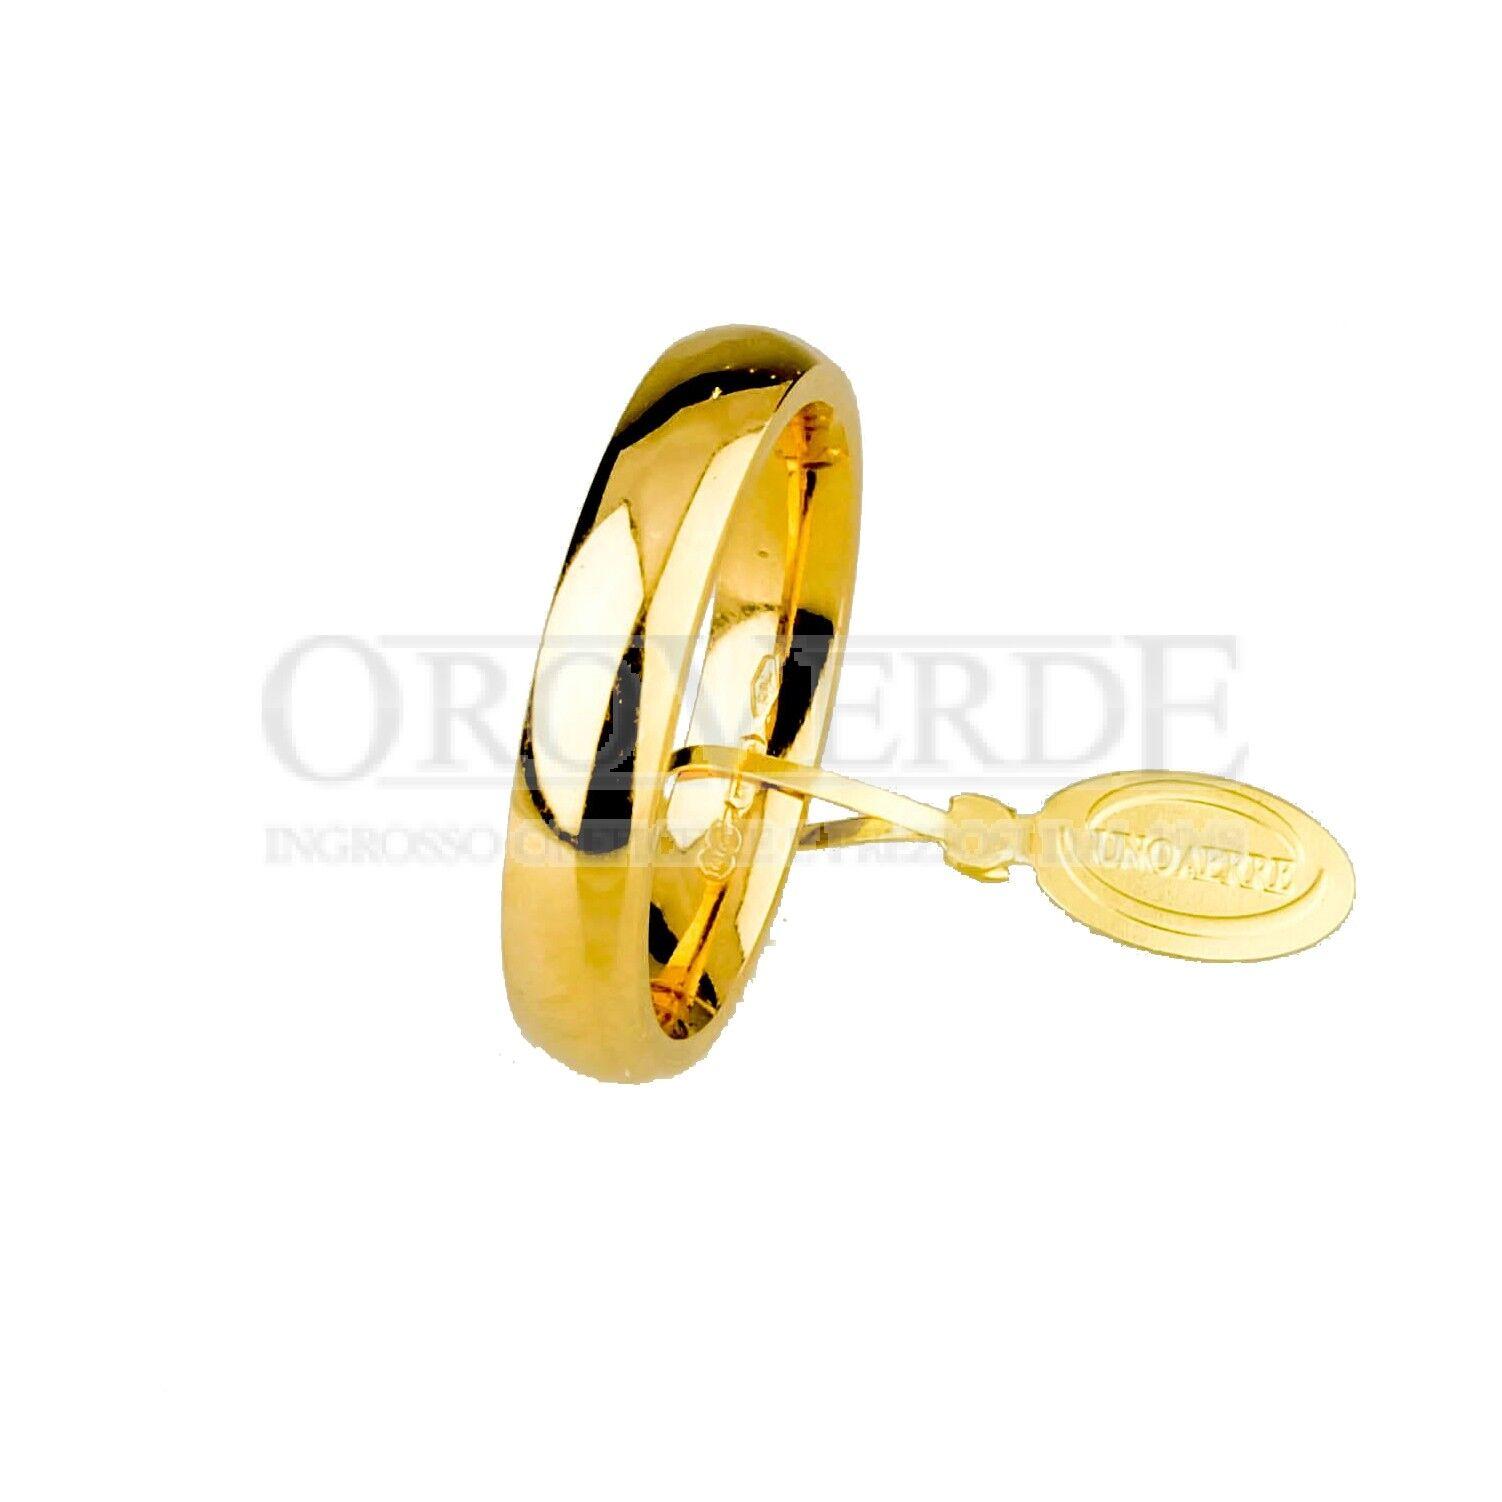 verde Gioielli fede comoda oro 750% Unoaerre larg. larg. larg. 3 5mm 35AFC1G8- 257 00 a273a3